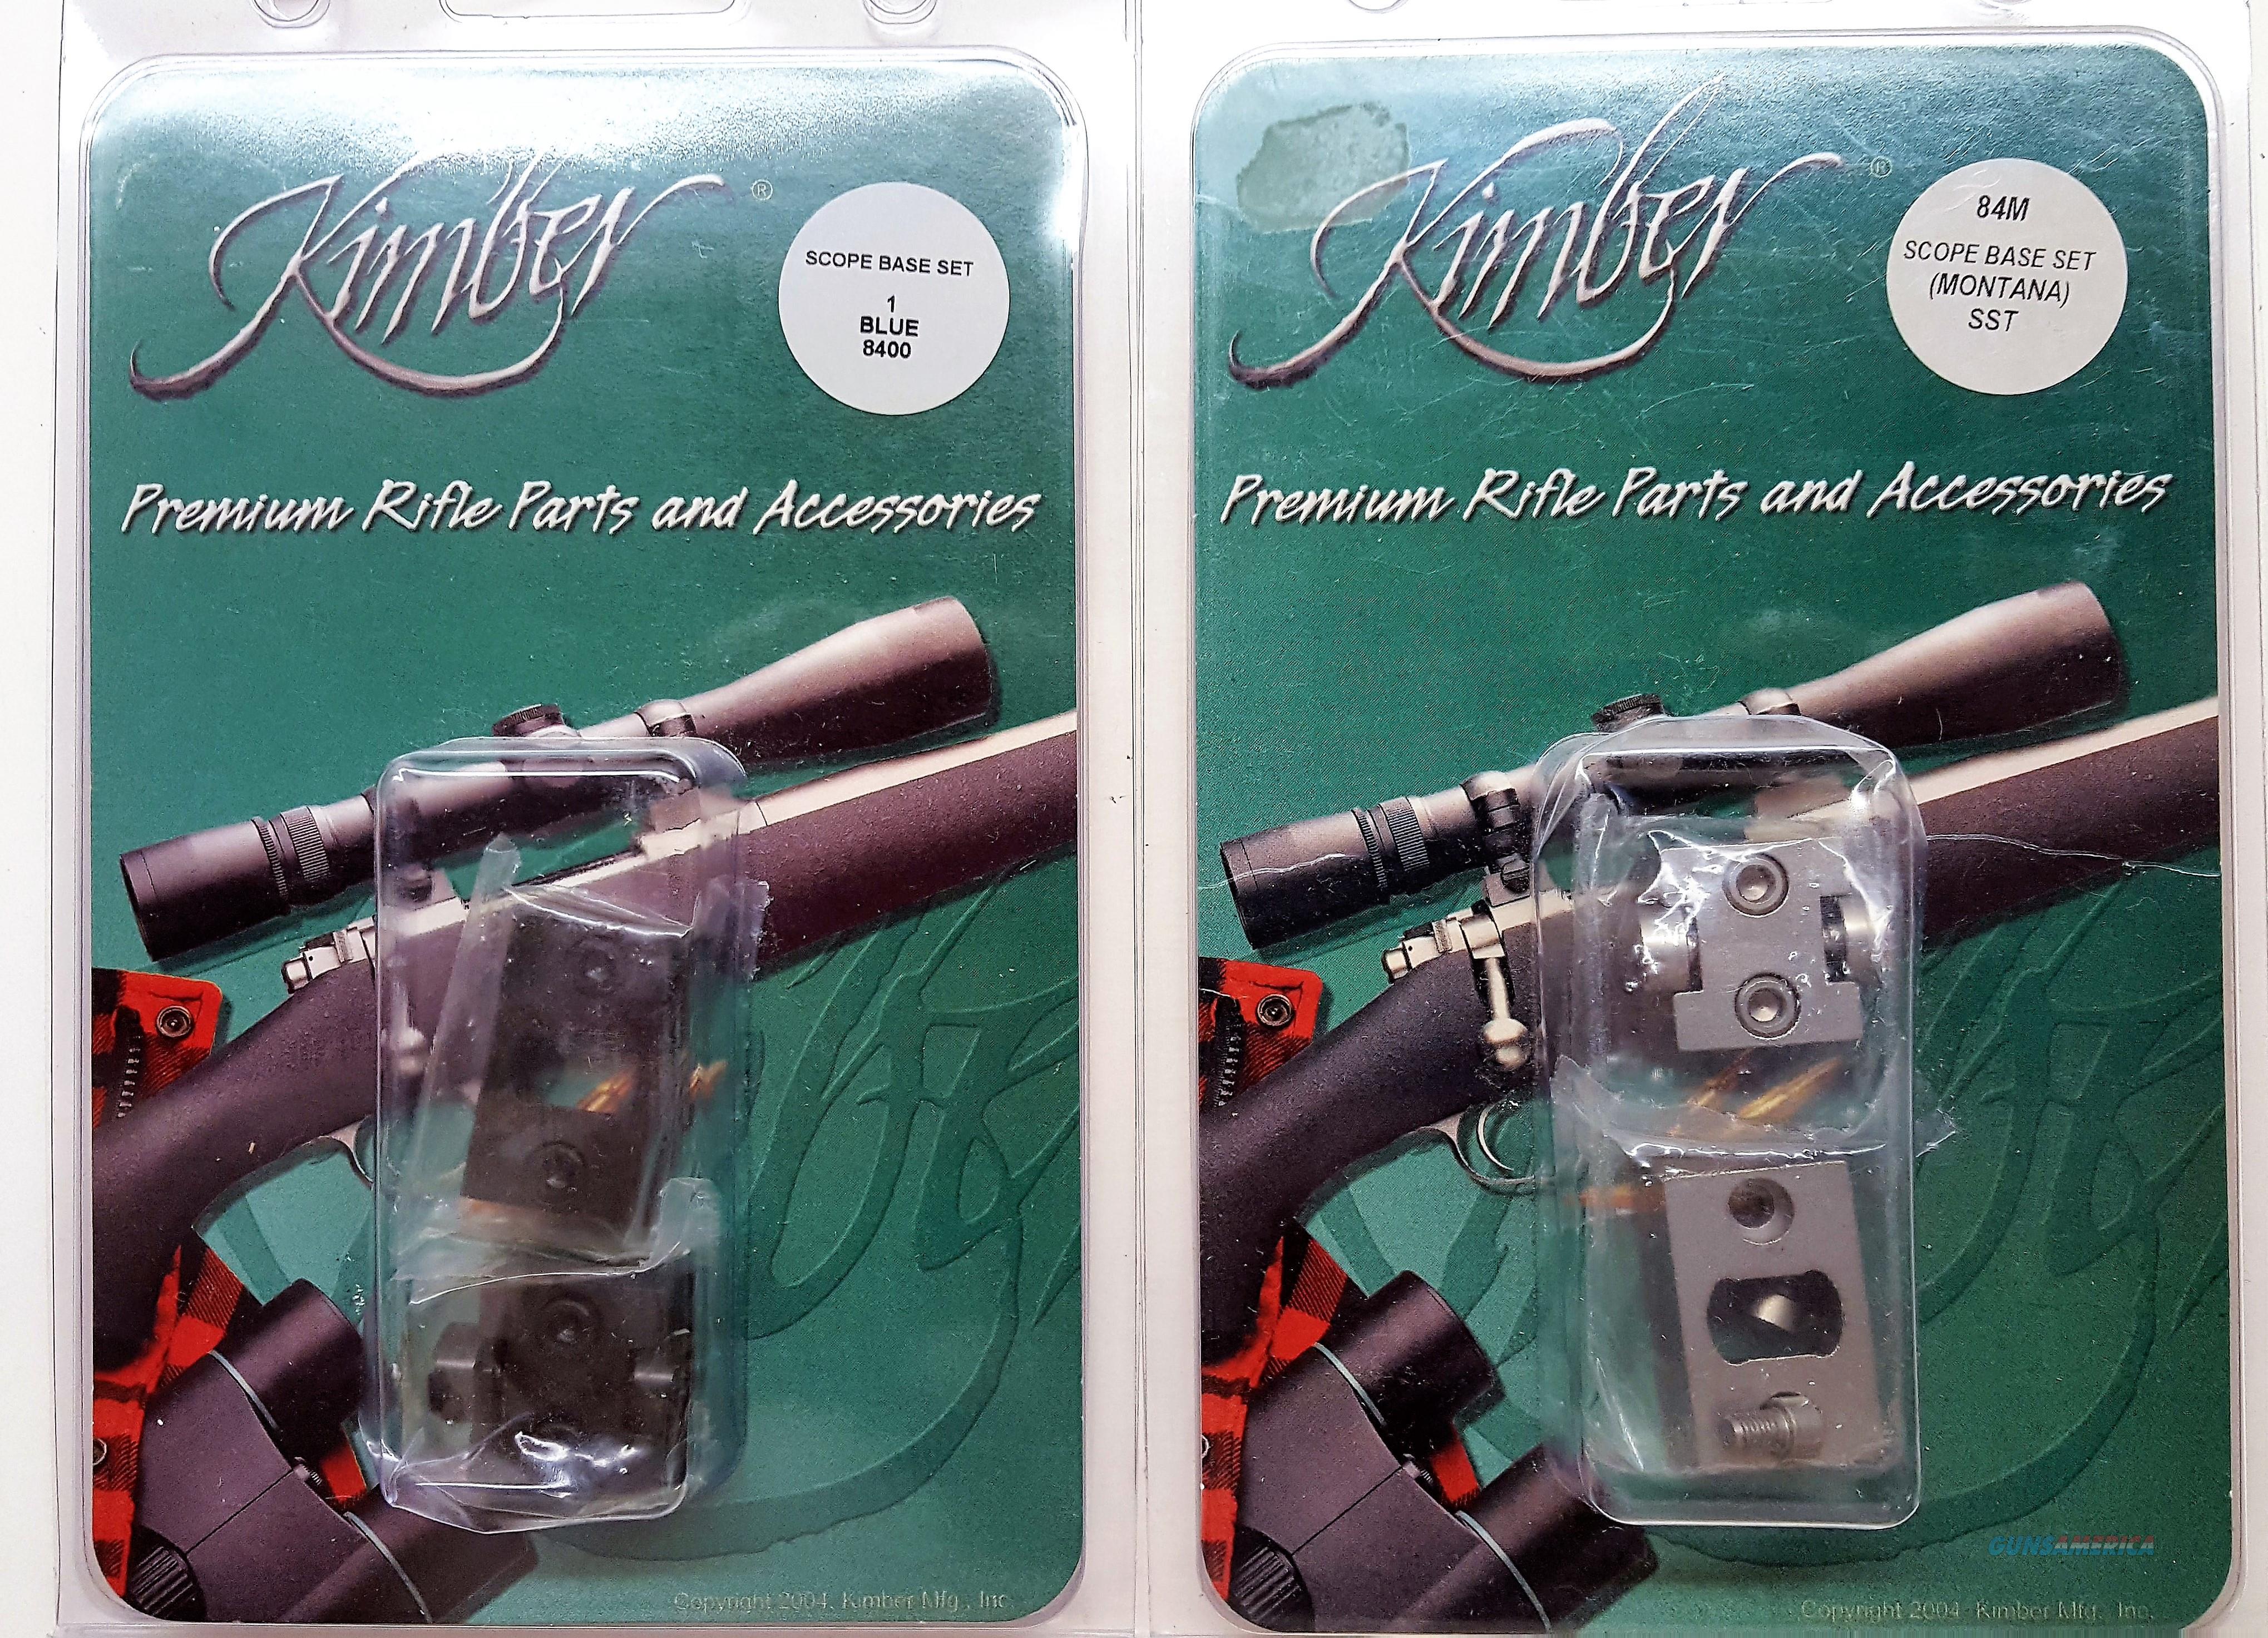 KIMBER BASE MOUNT CLOSEOUT 84M AND 8400 (POST 2004)  Non-Guns > Scopes/Mounts/Rings & Optics > Mounts > Other